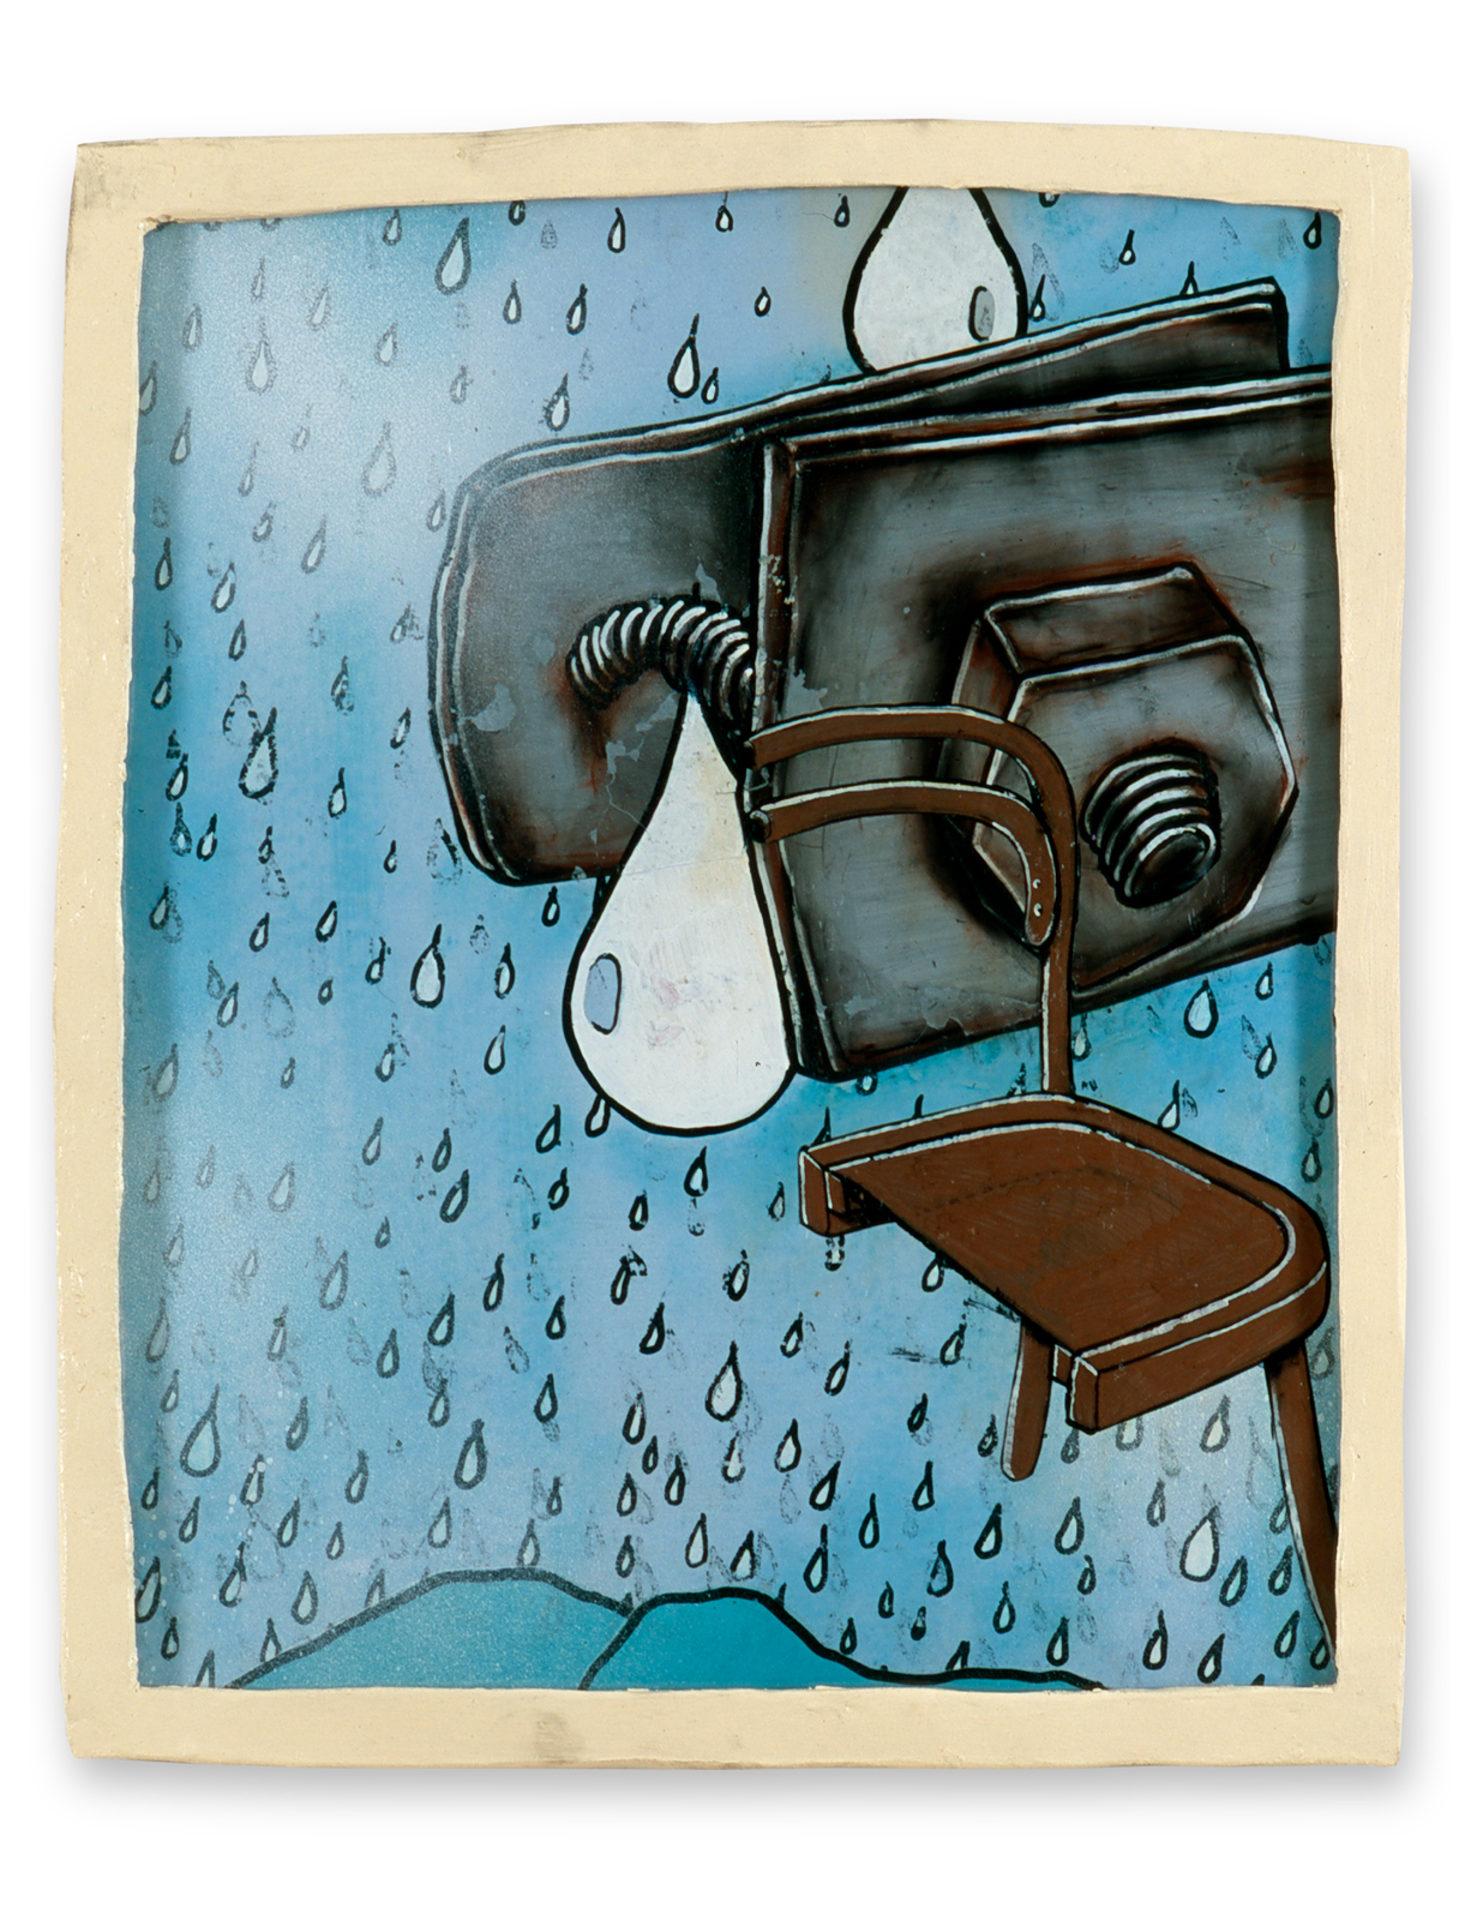 Portrait of a single raindrop